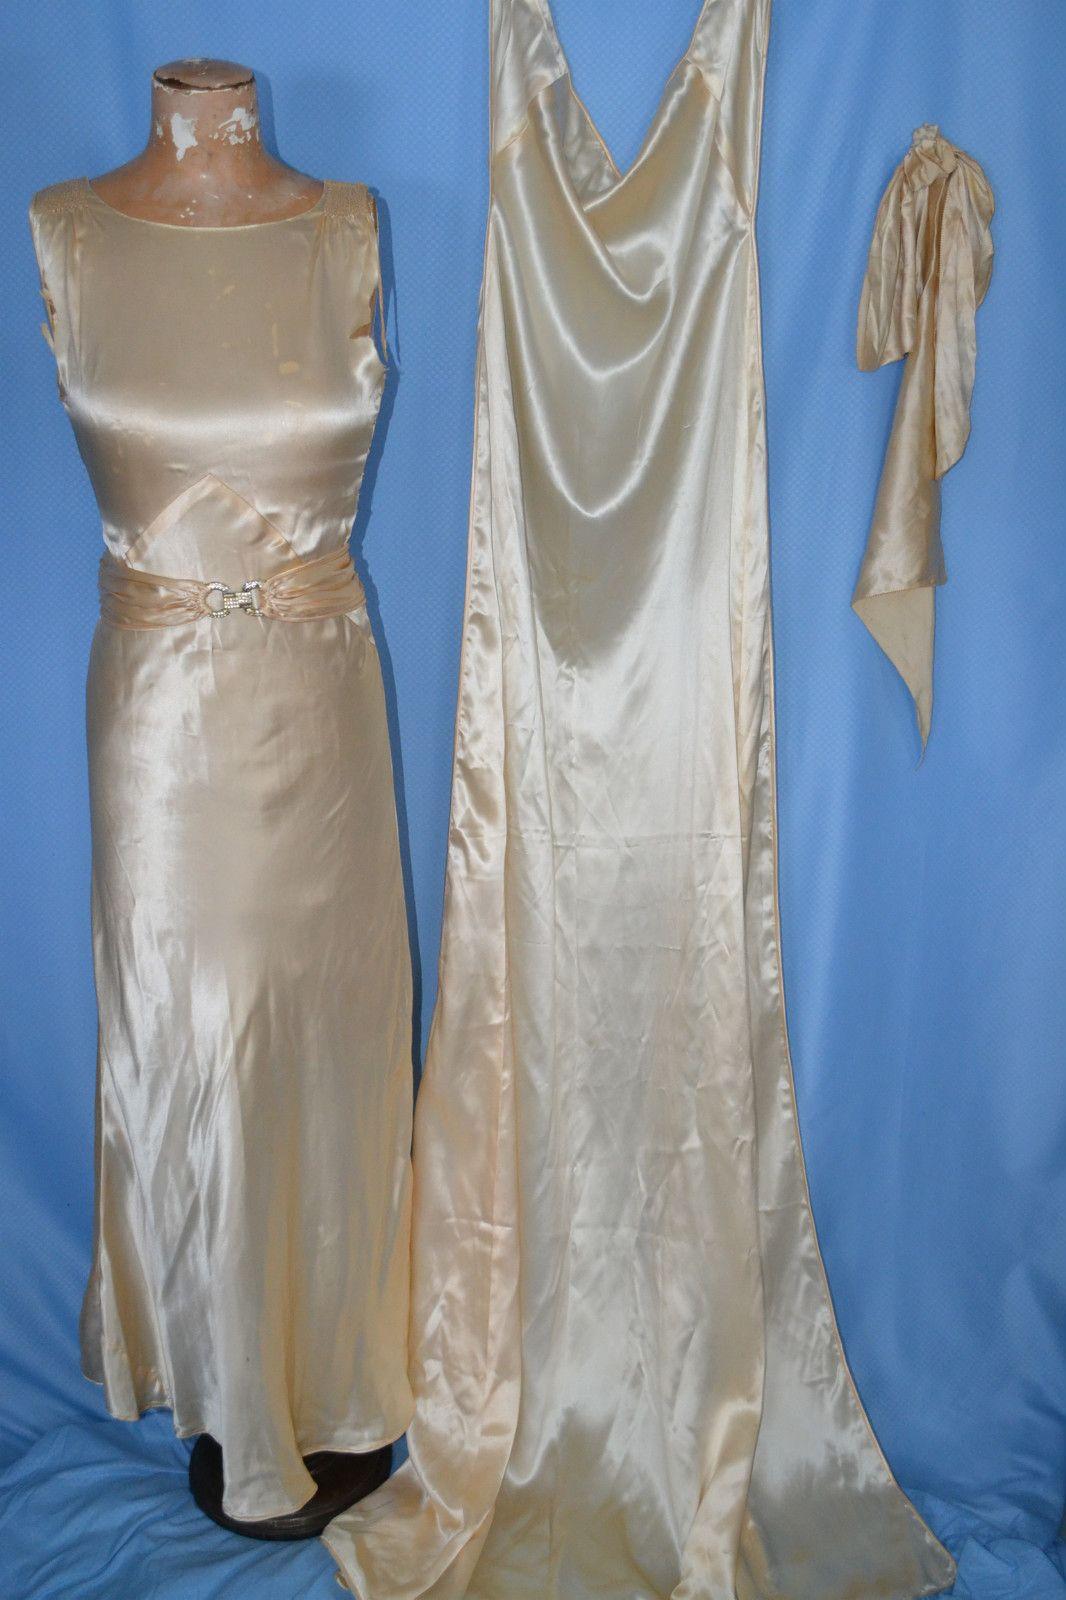 1930s silk wedding dress with detachable train. Ebay